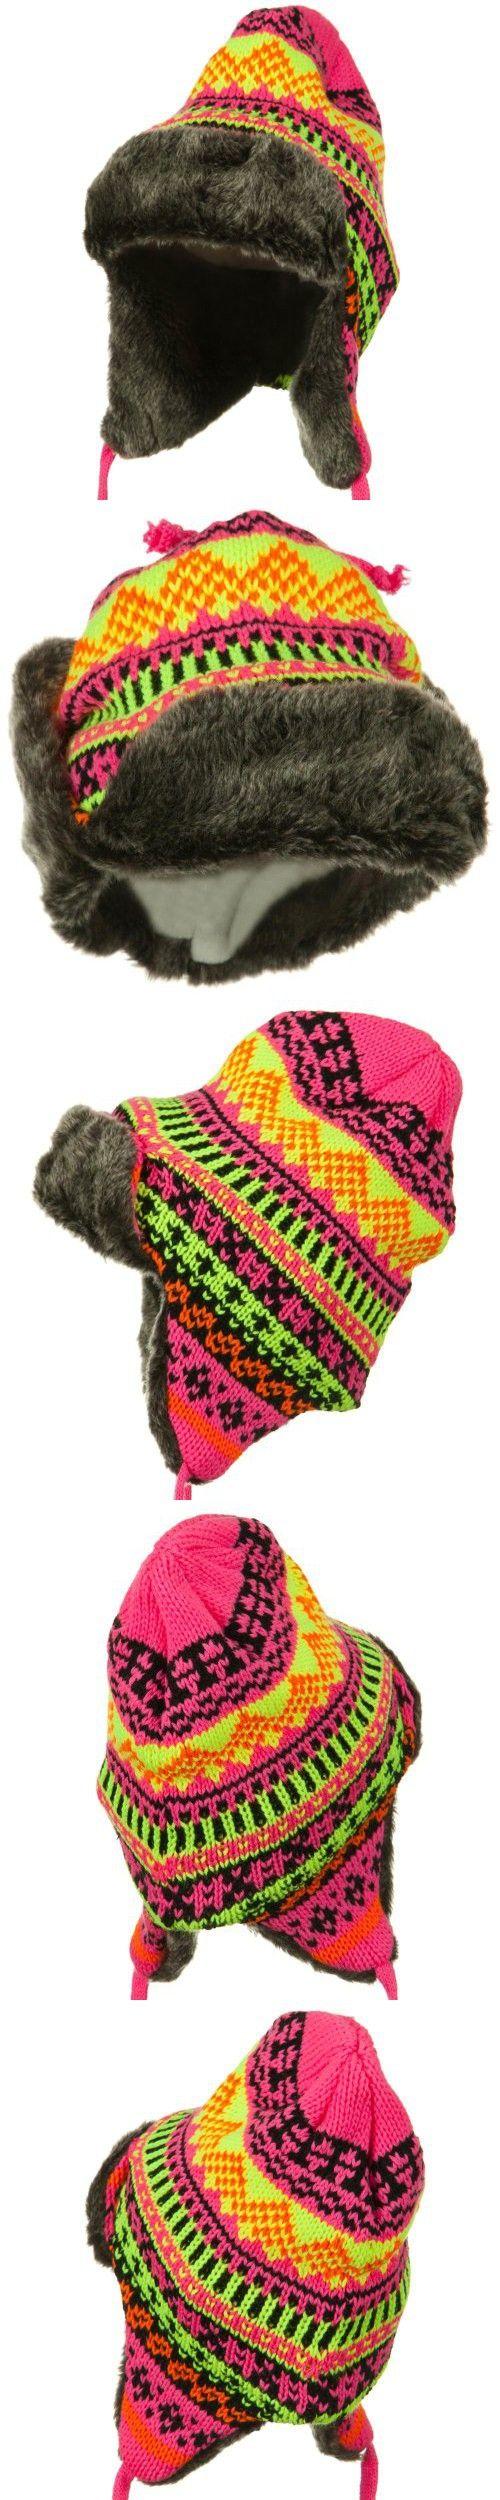 Neon Color Knit Trooper Hats - Neon Pink